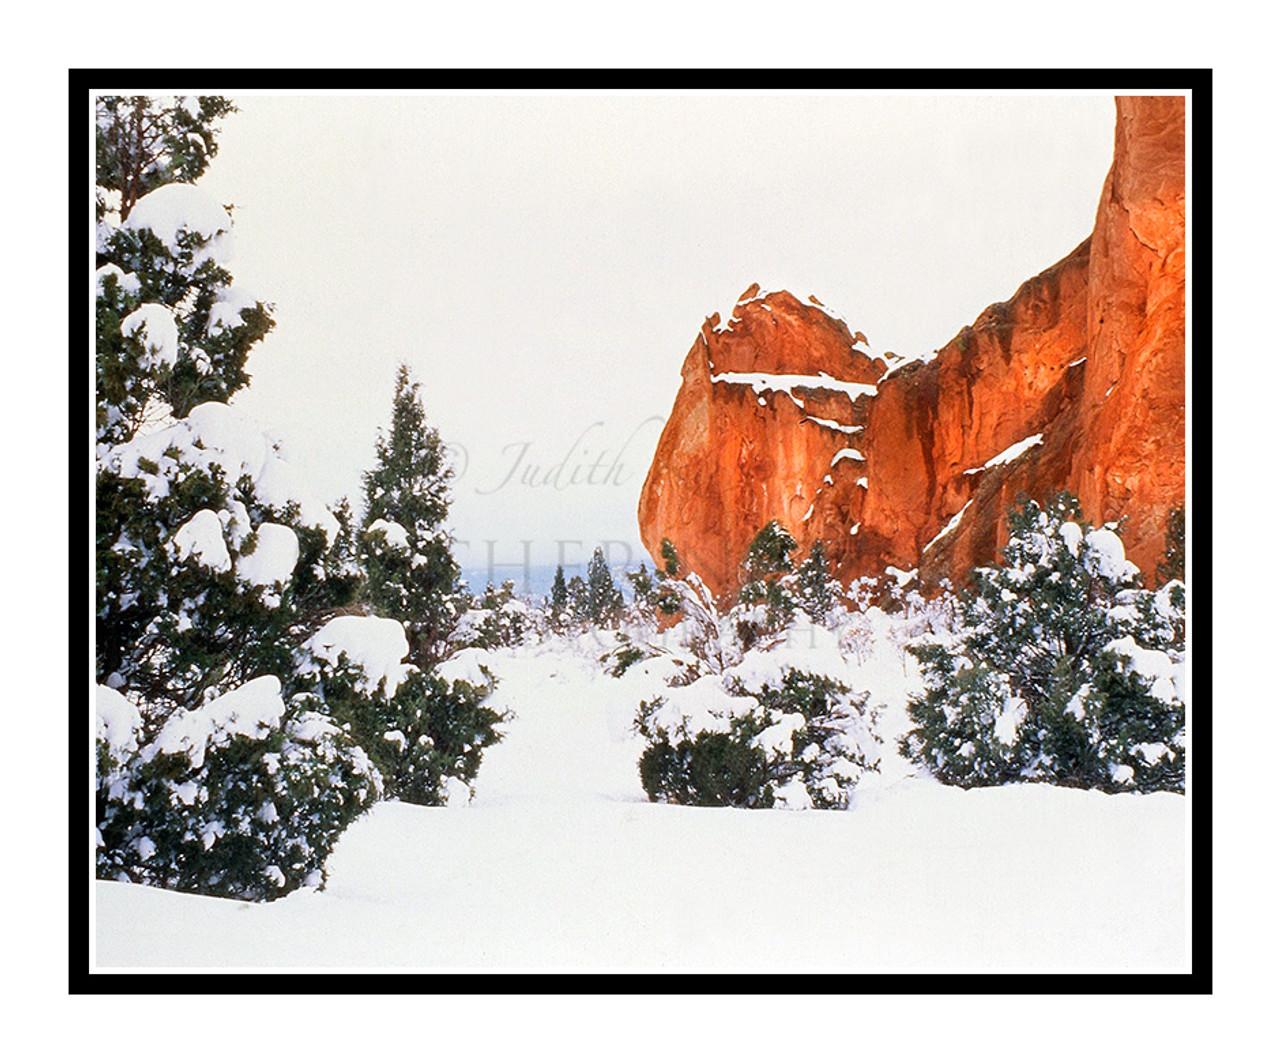 Garden Of The Gods Winter In Colorado Springs Colorado 257